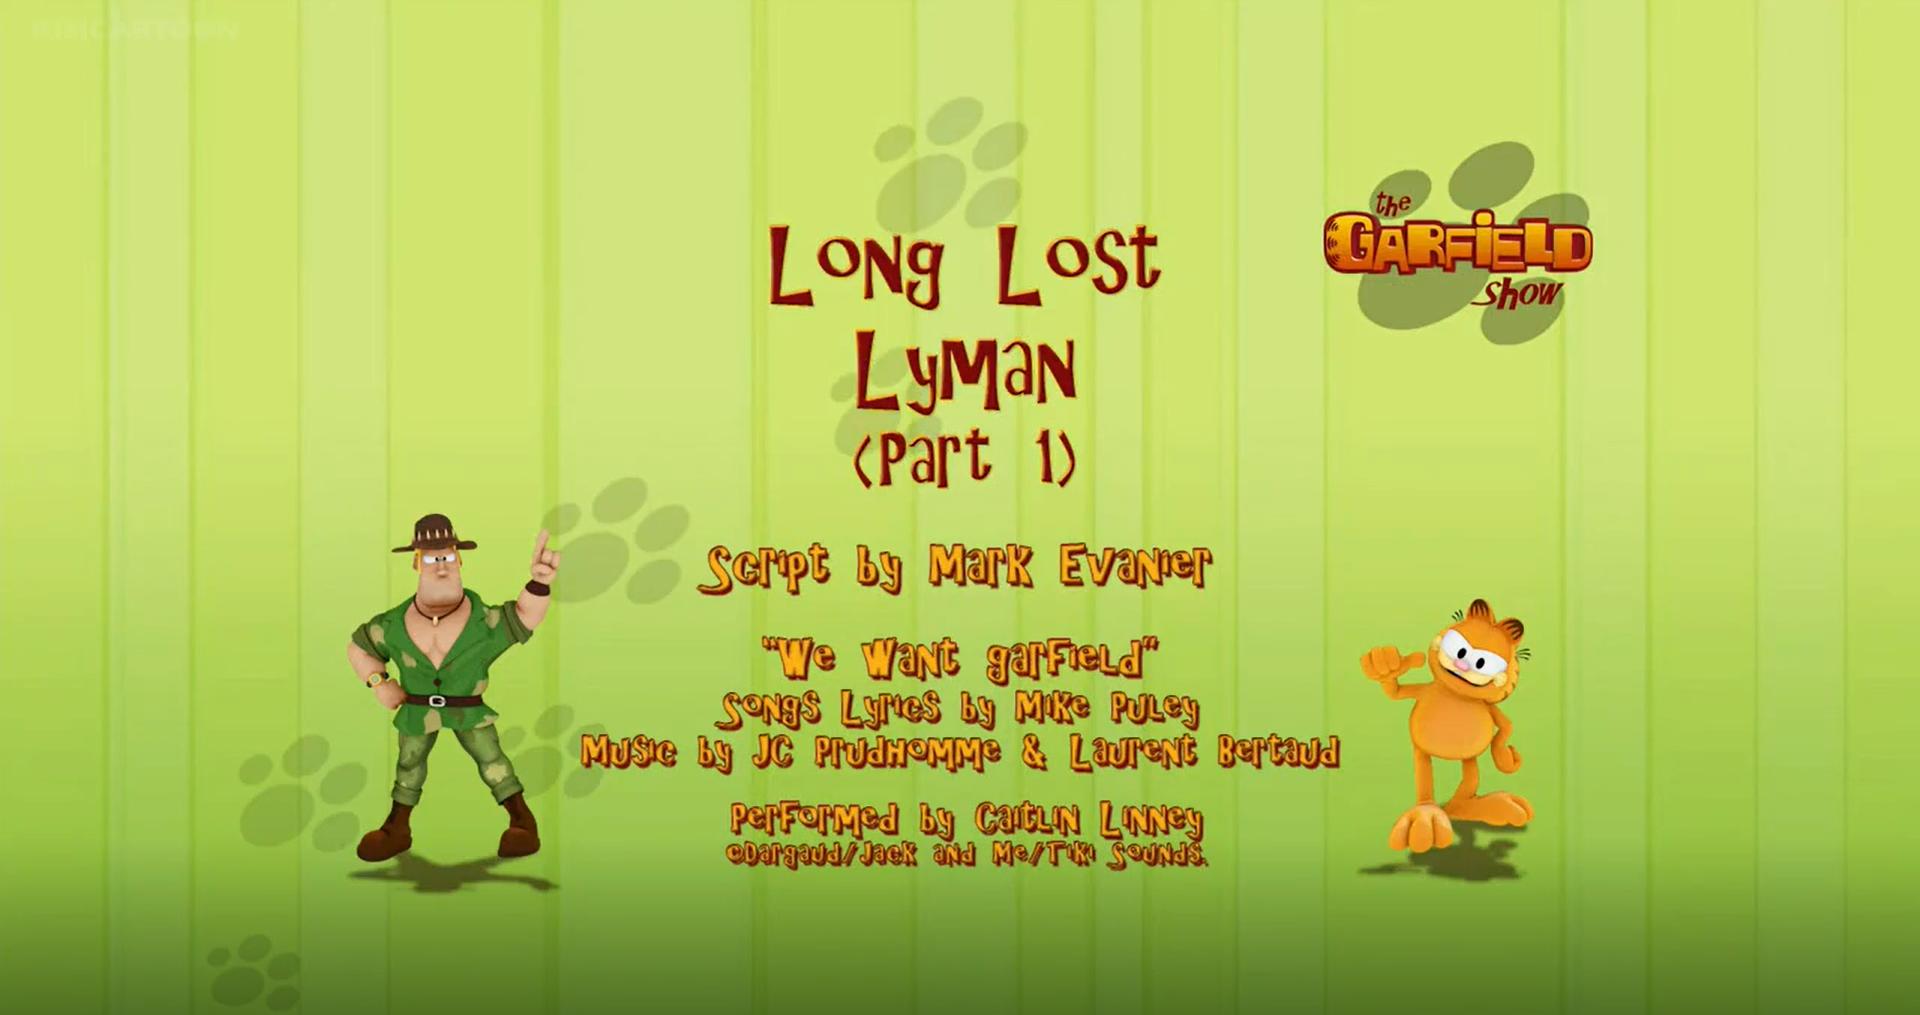 Long Lost Lyman Part 1